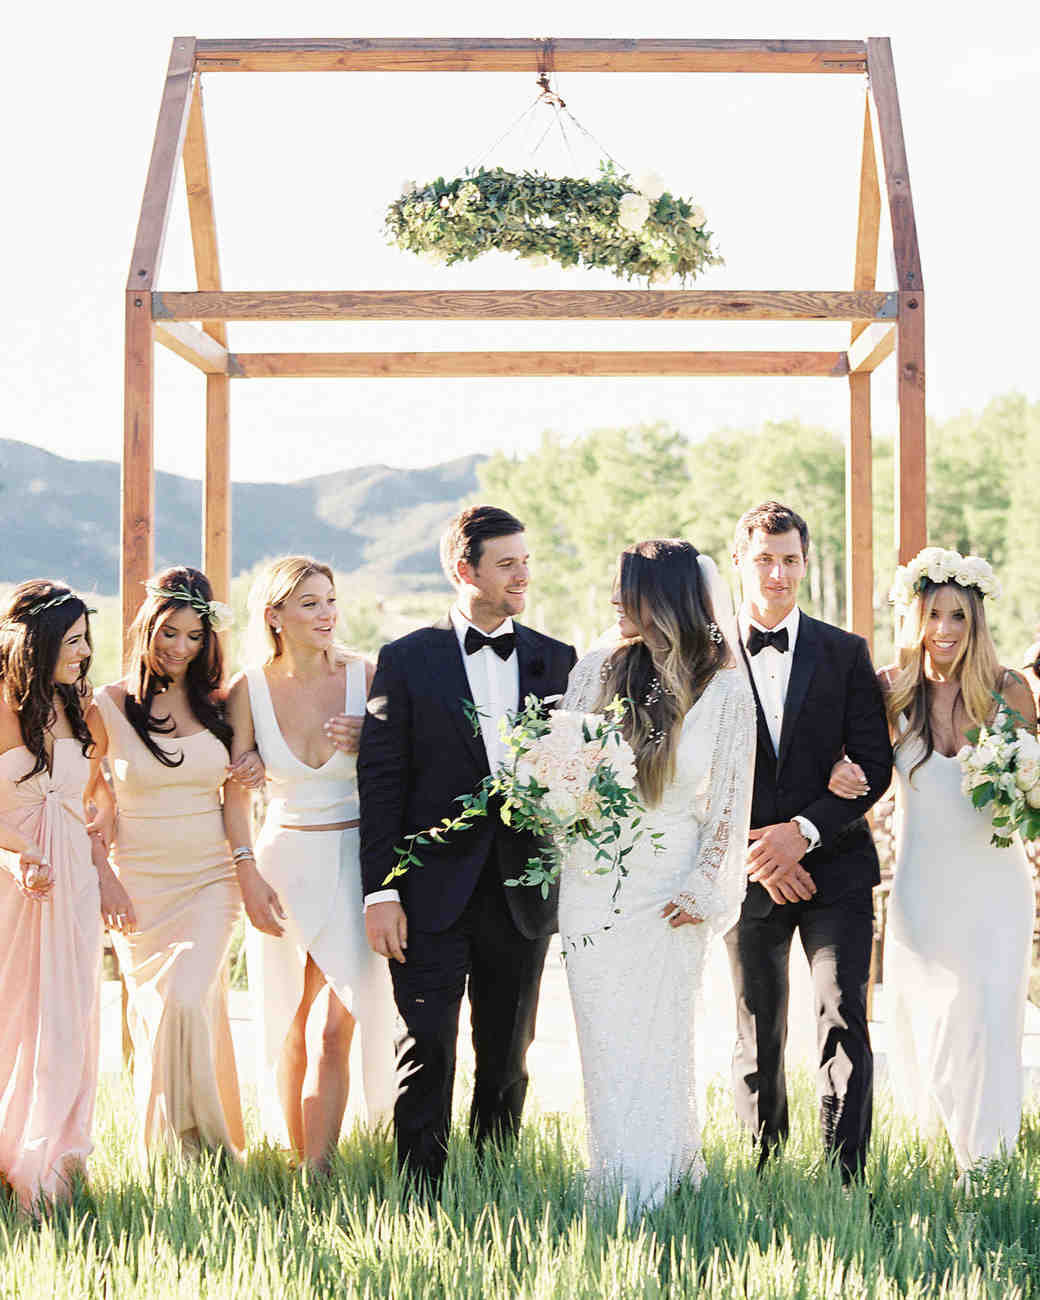 wedding-weekend-ideas-bridal-party-0416.jpg